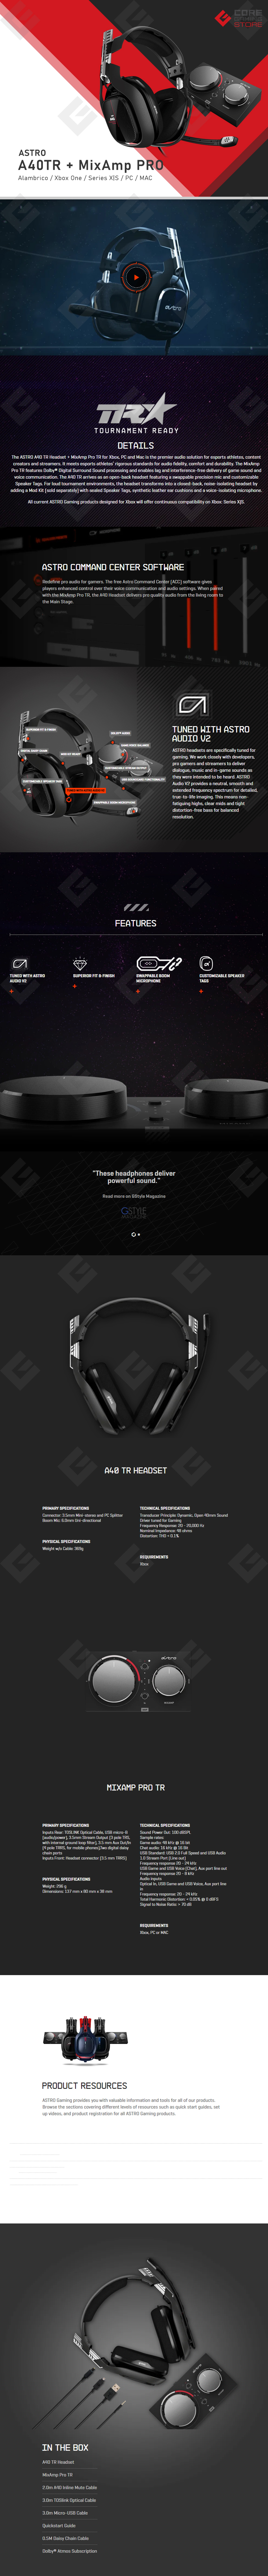 Diadema Astro A40 TR Headset + MixAmp Pro TR / Xbox One / Series X S  / PC / MAC - (Logitech)